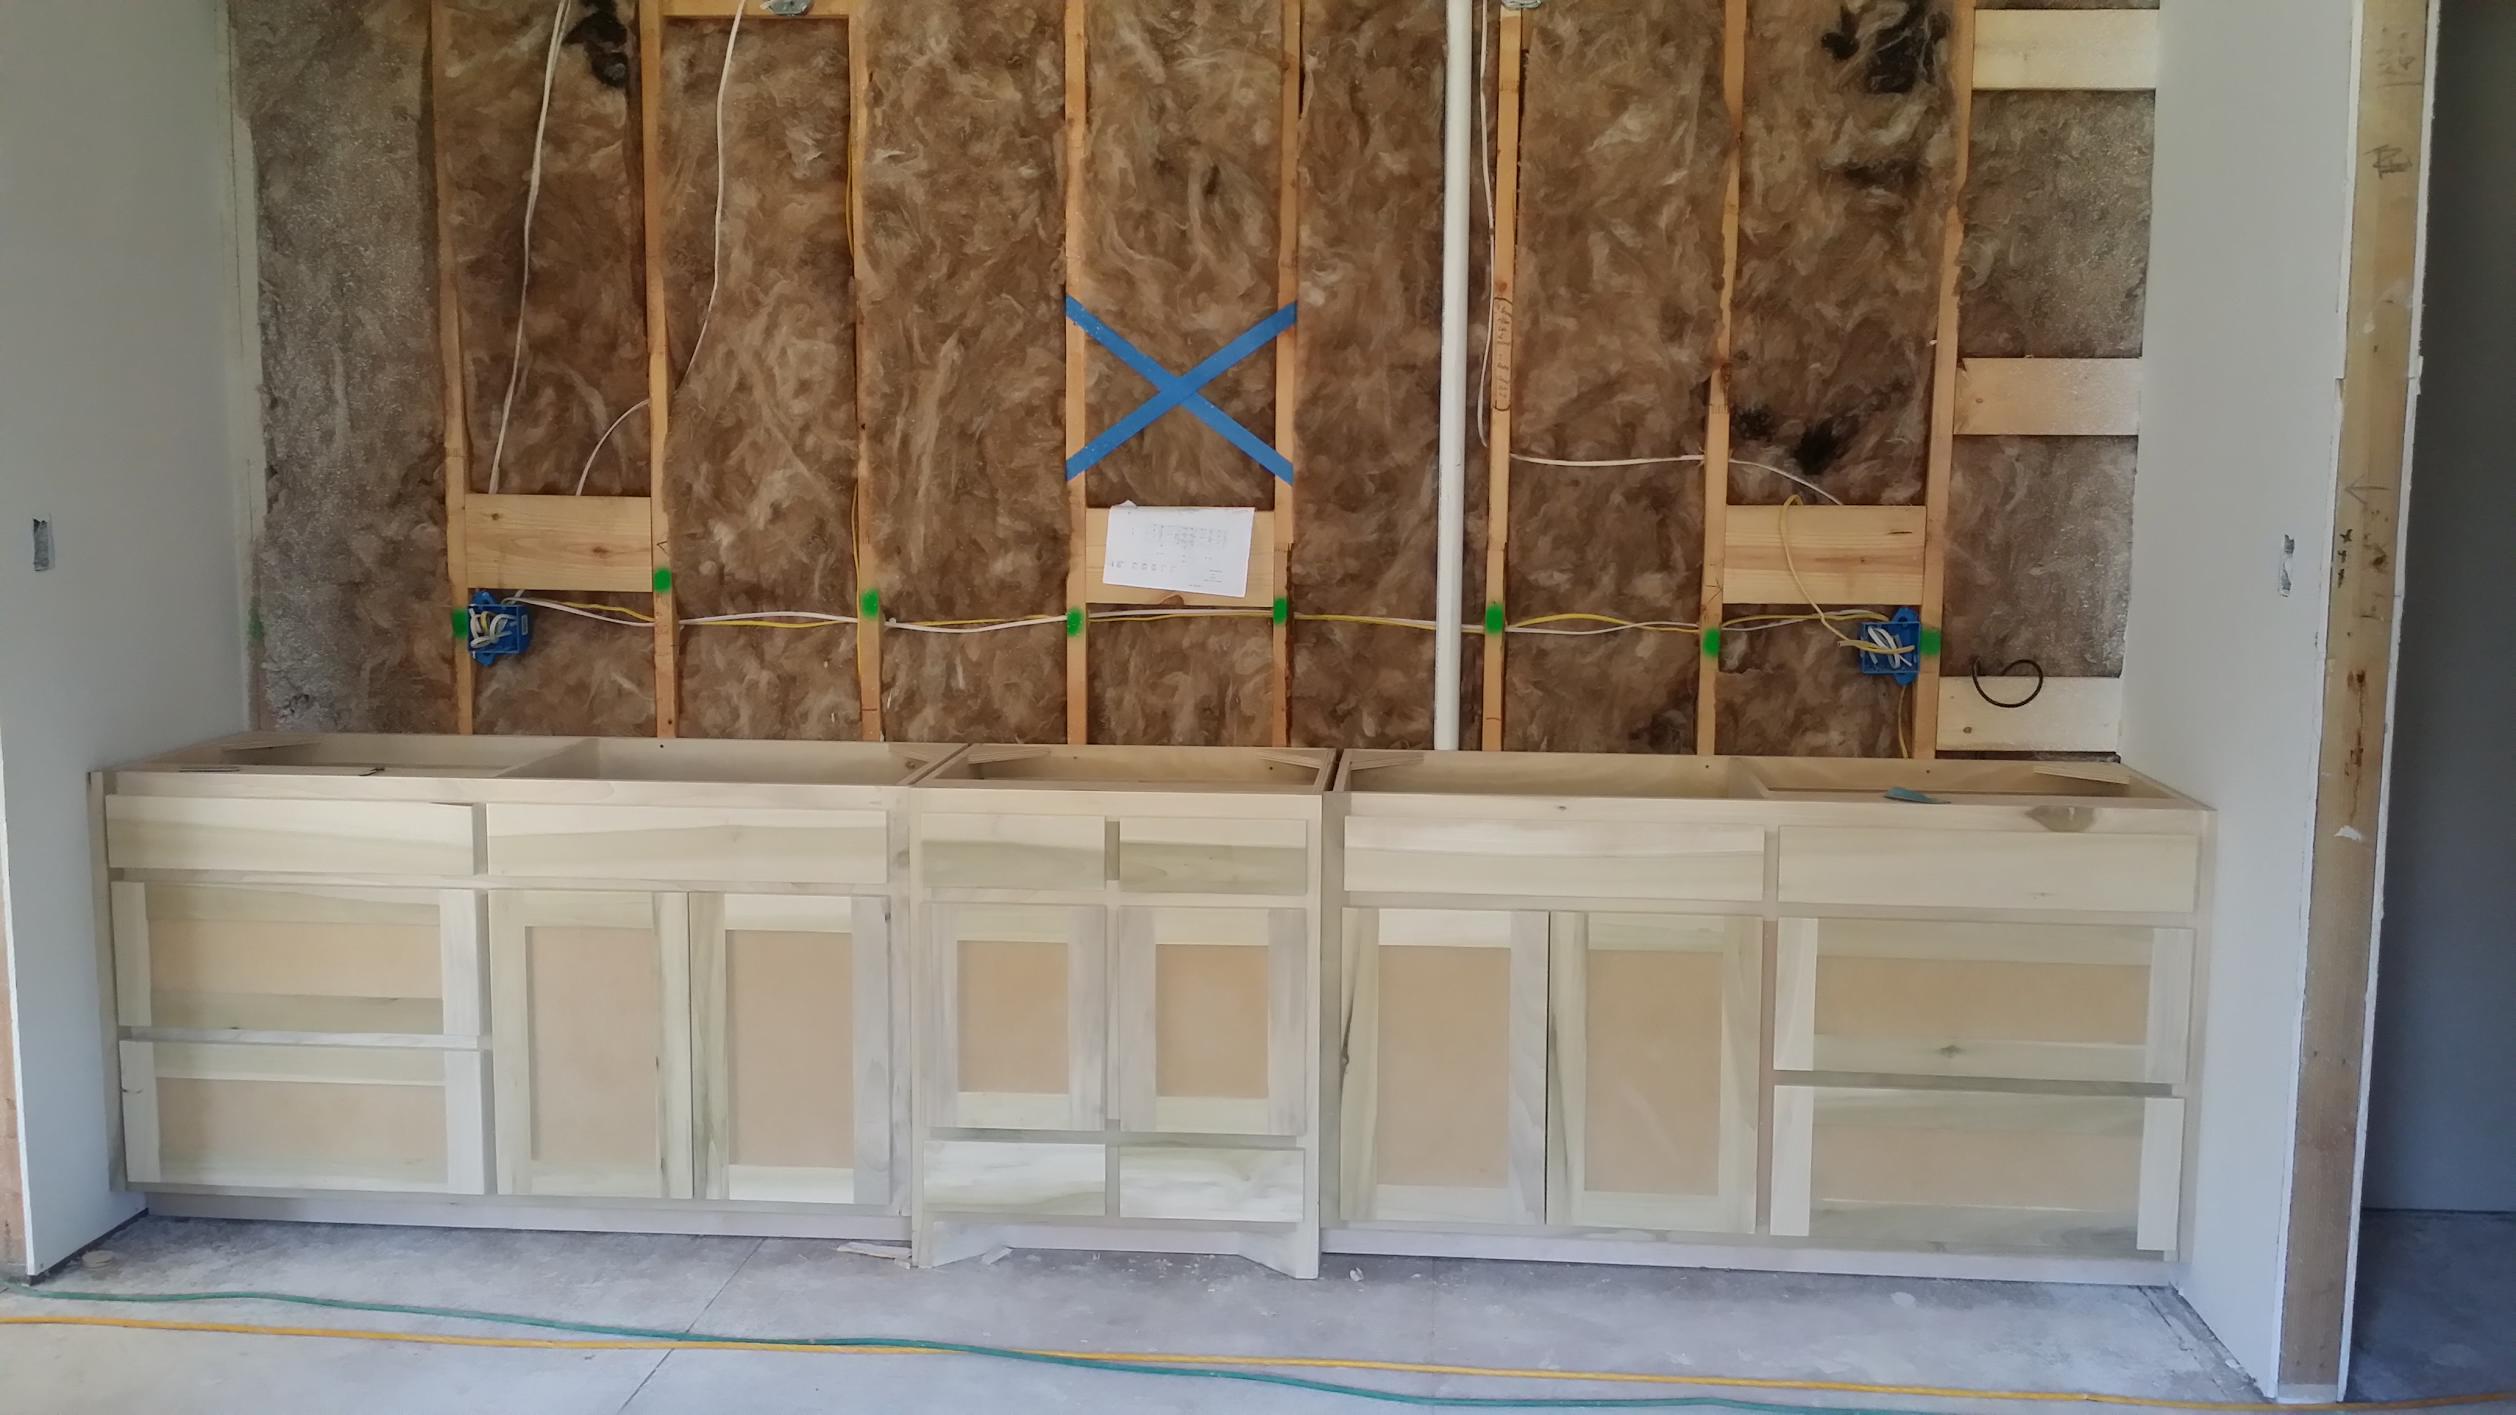 cabinets13